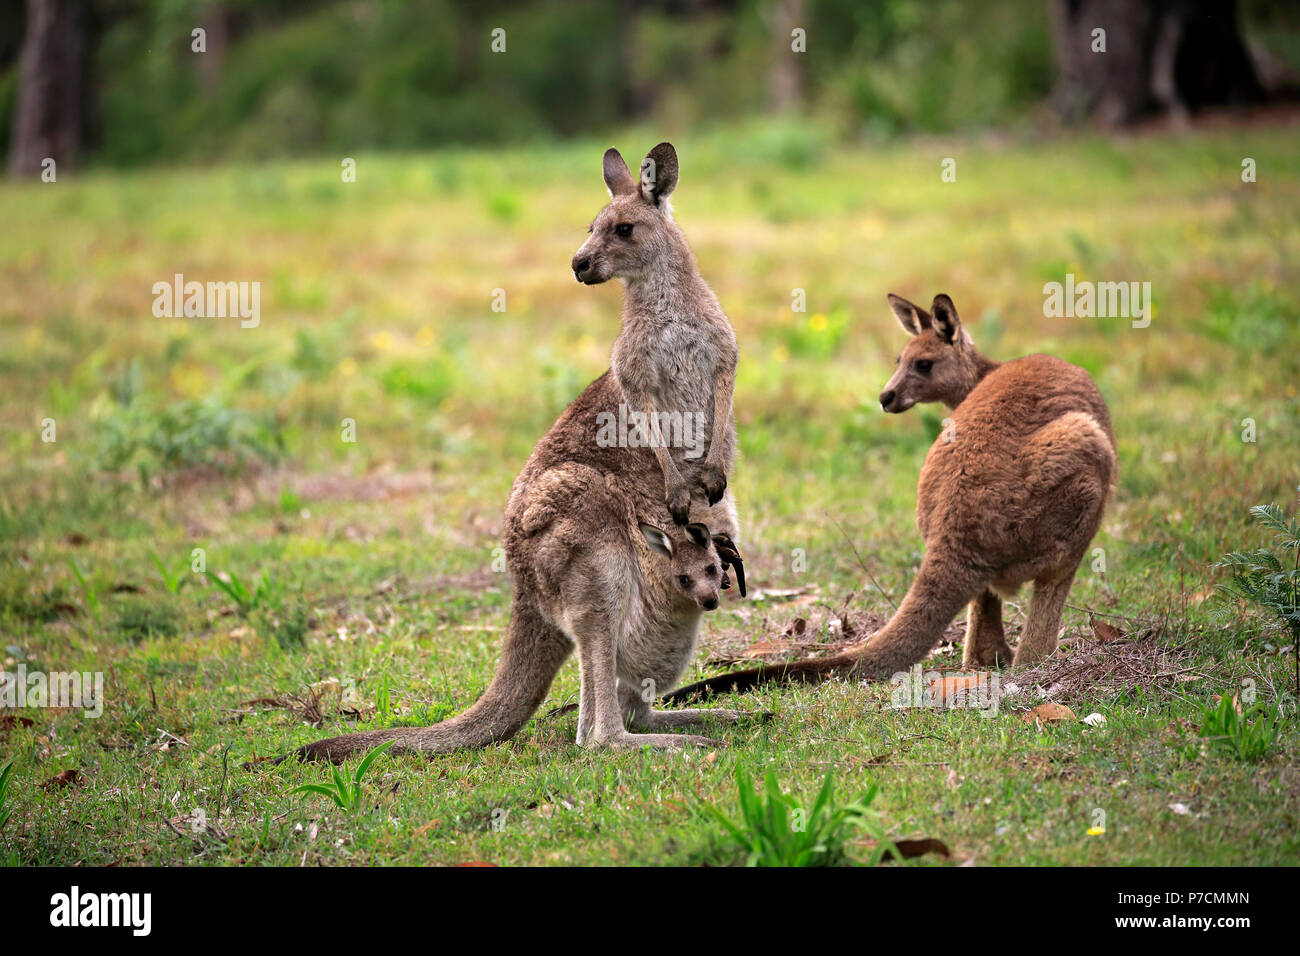 Eastern Grey Kangaroo, adult with joey in pouch, Merry Beach, Murramarang Nationalpark, New South Wales, Australia, (Macropus giganteus) - Stock Image